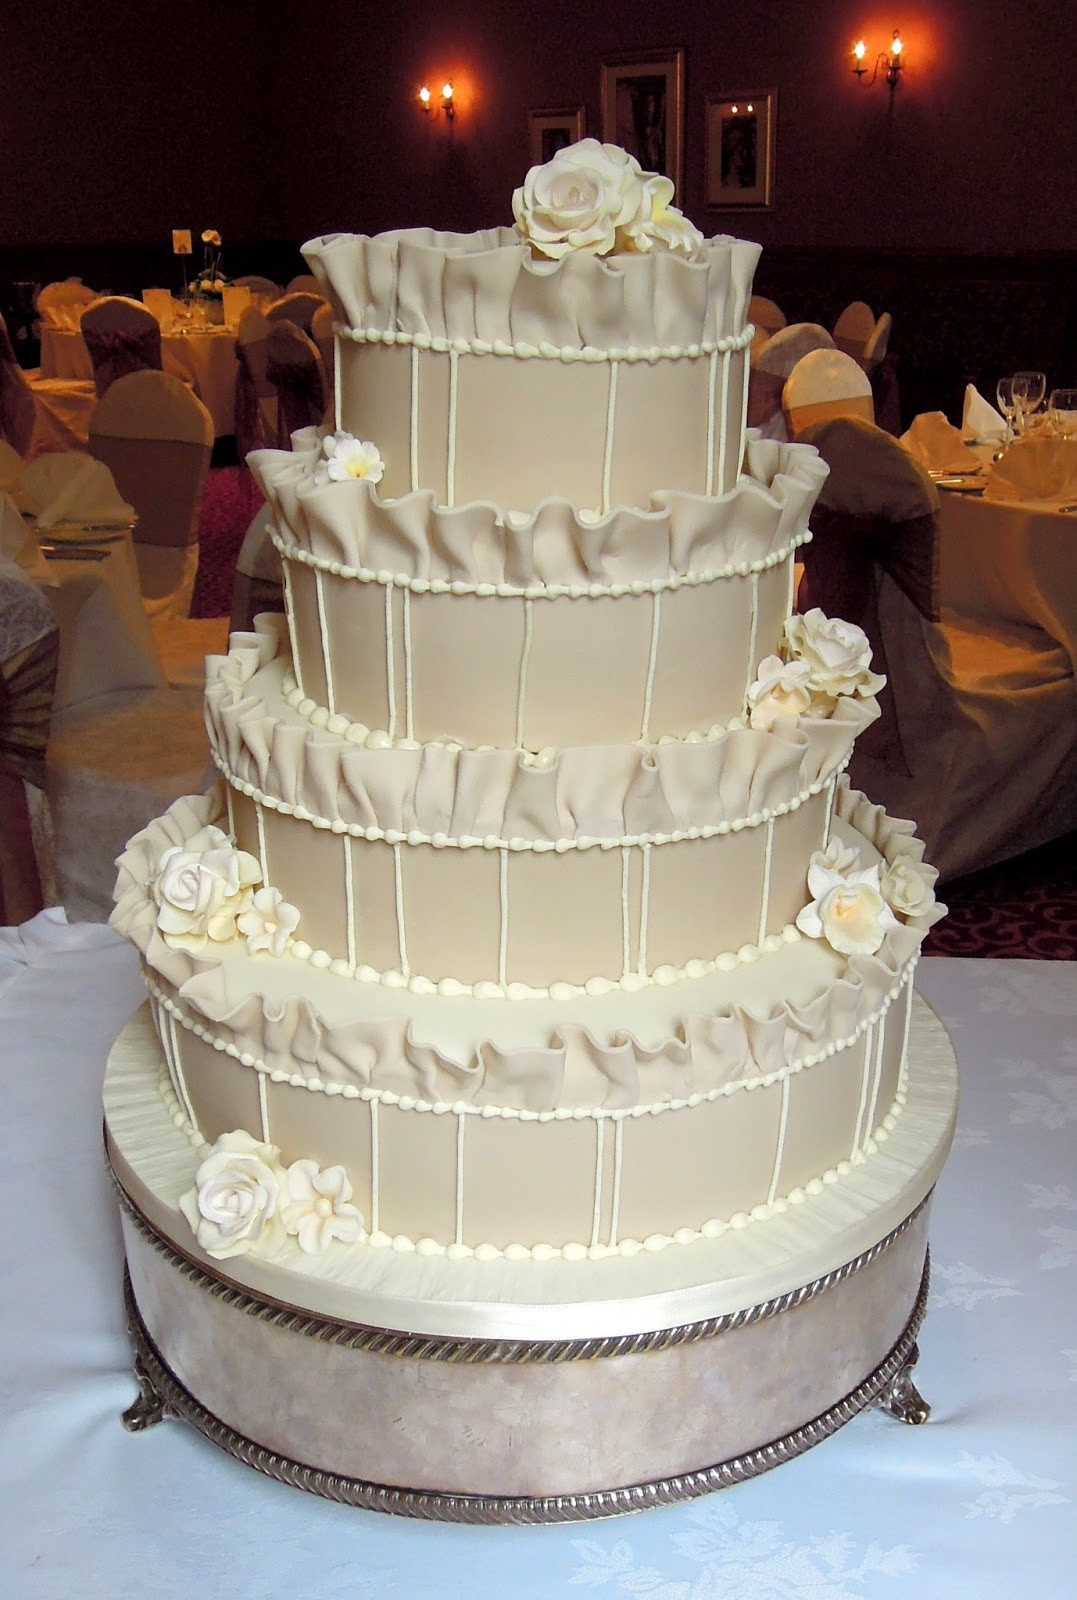 Wedding Cakes Pics  Cake [grrls] cakery